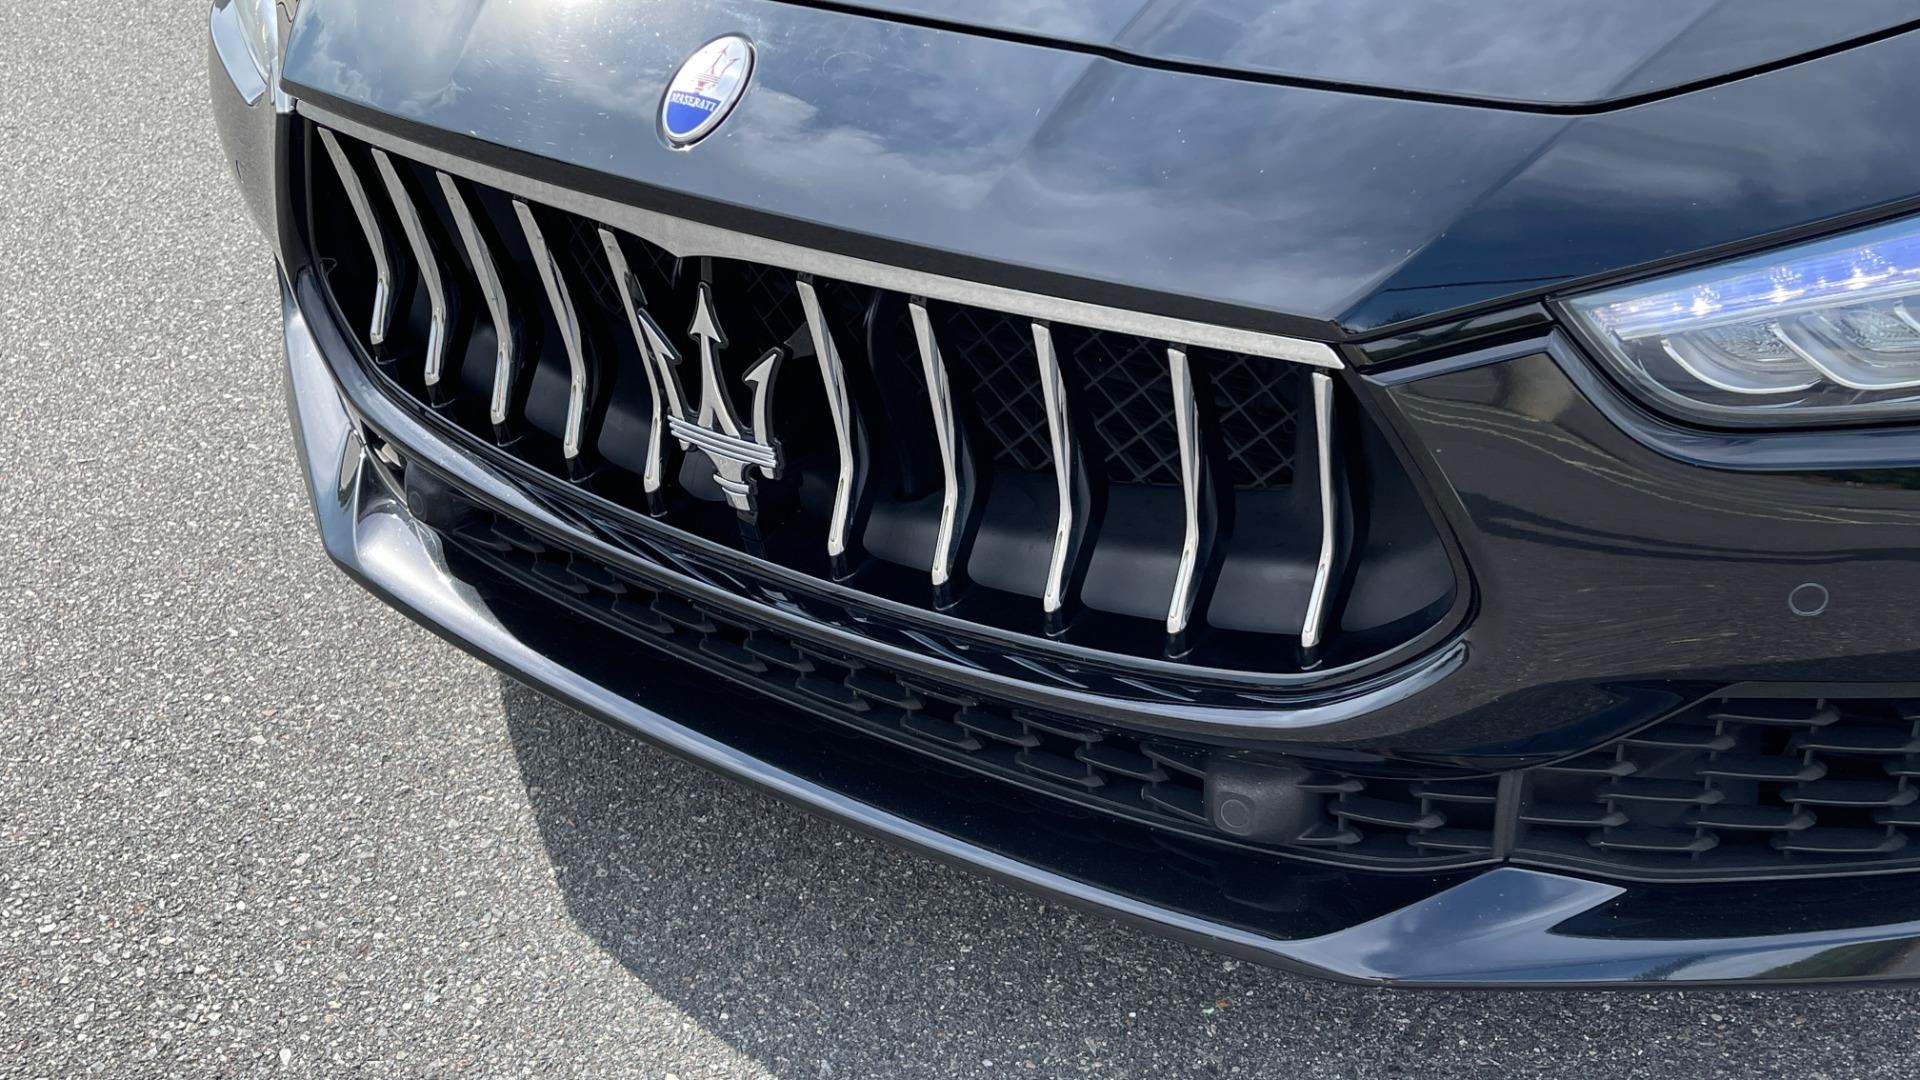 Used 2018 Maserati GHIBLI 3.0L SEDAN / 8-SPD AUTO / NAV / SUNROOF / REARVIEW for sale $42,995 at Formula Imports in Charlotte NC 28227 17